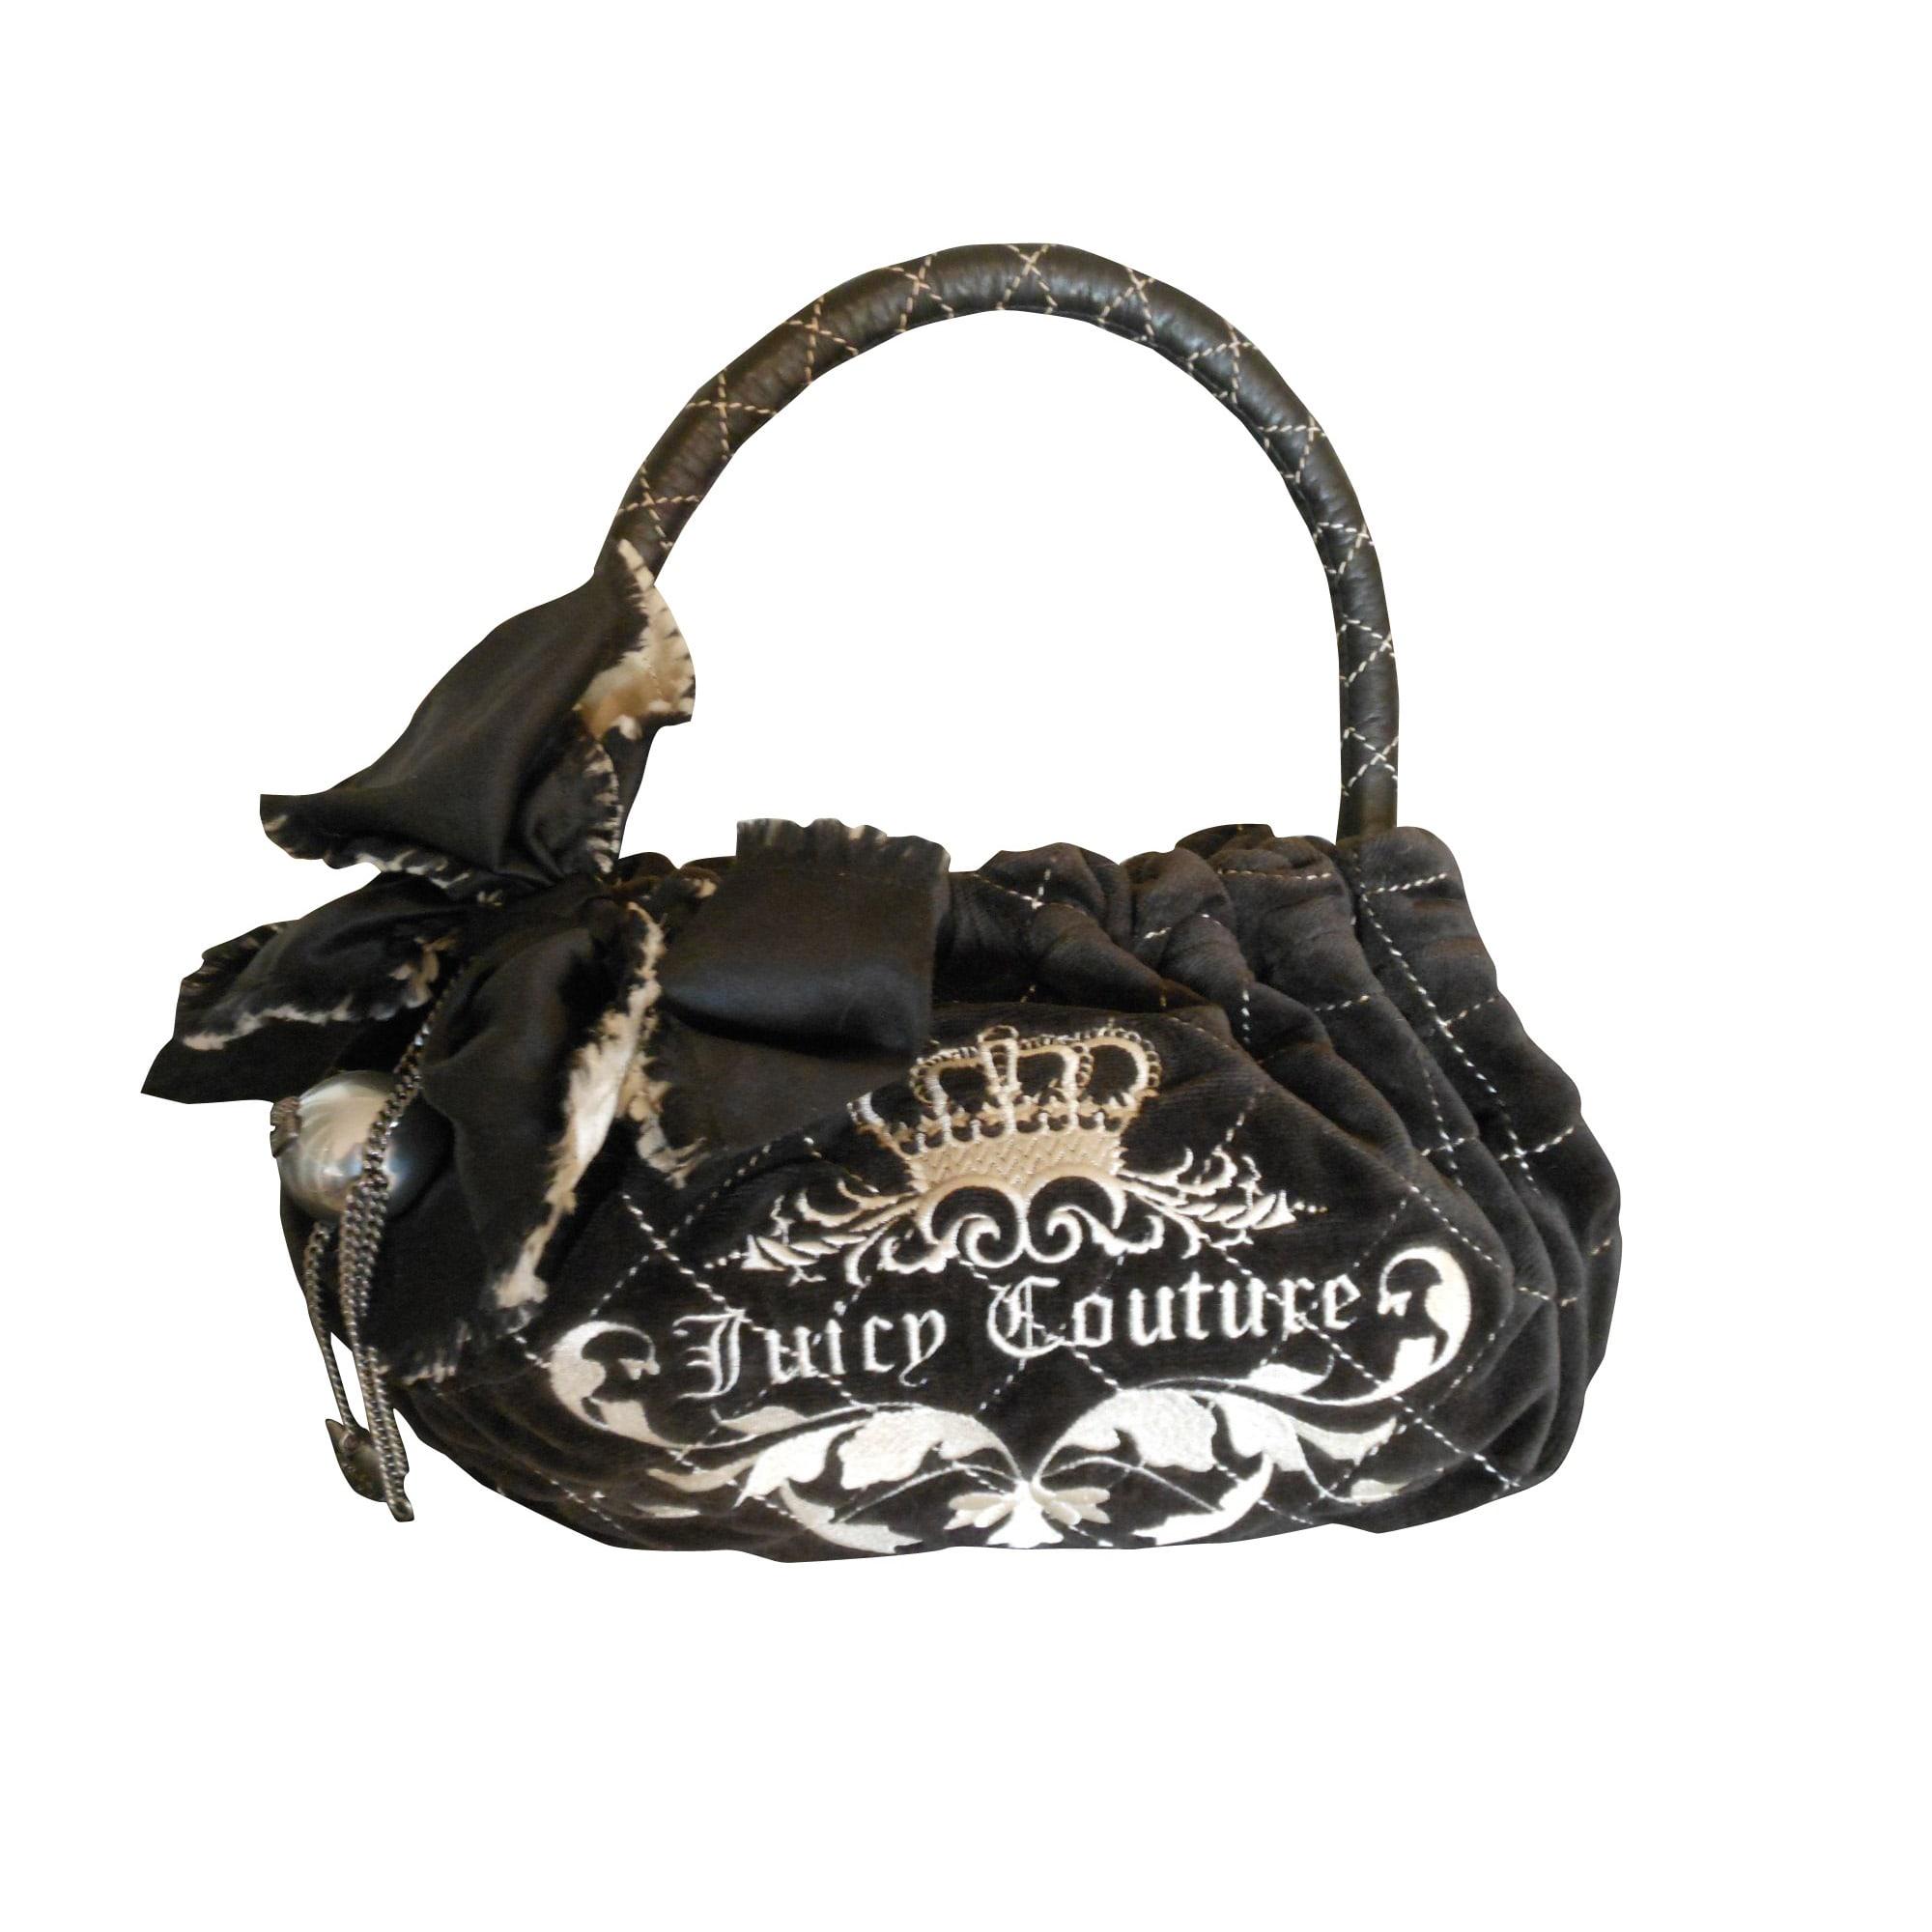 sac main en tissu juicy couture noir 7770210. Black Bedroom Furniture Sets. Home Design Ideas